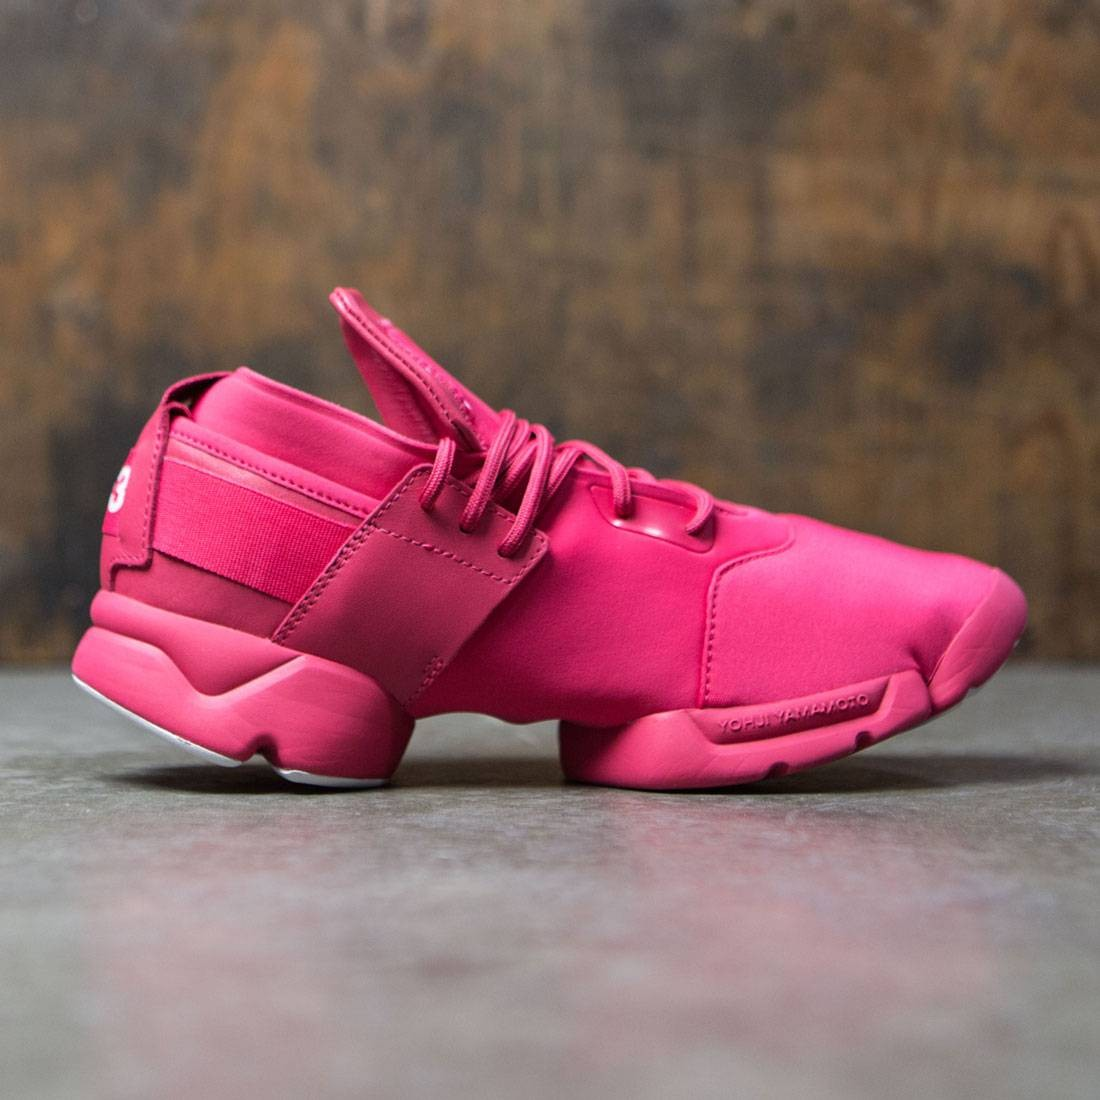 adc7d1307805 Adidas Y-3 Unisex Kydo pink blaze pink